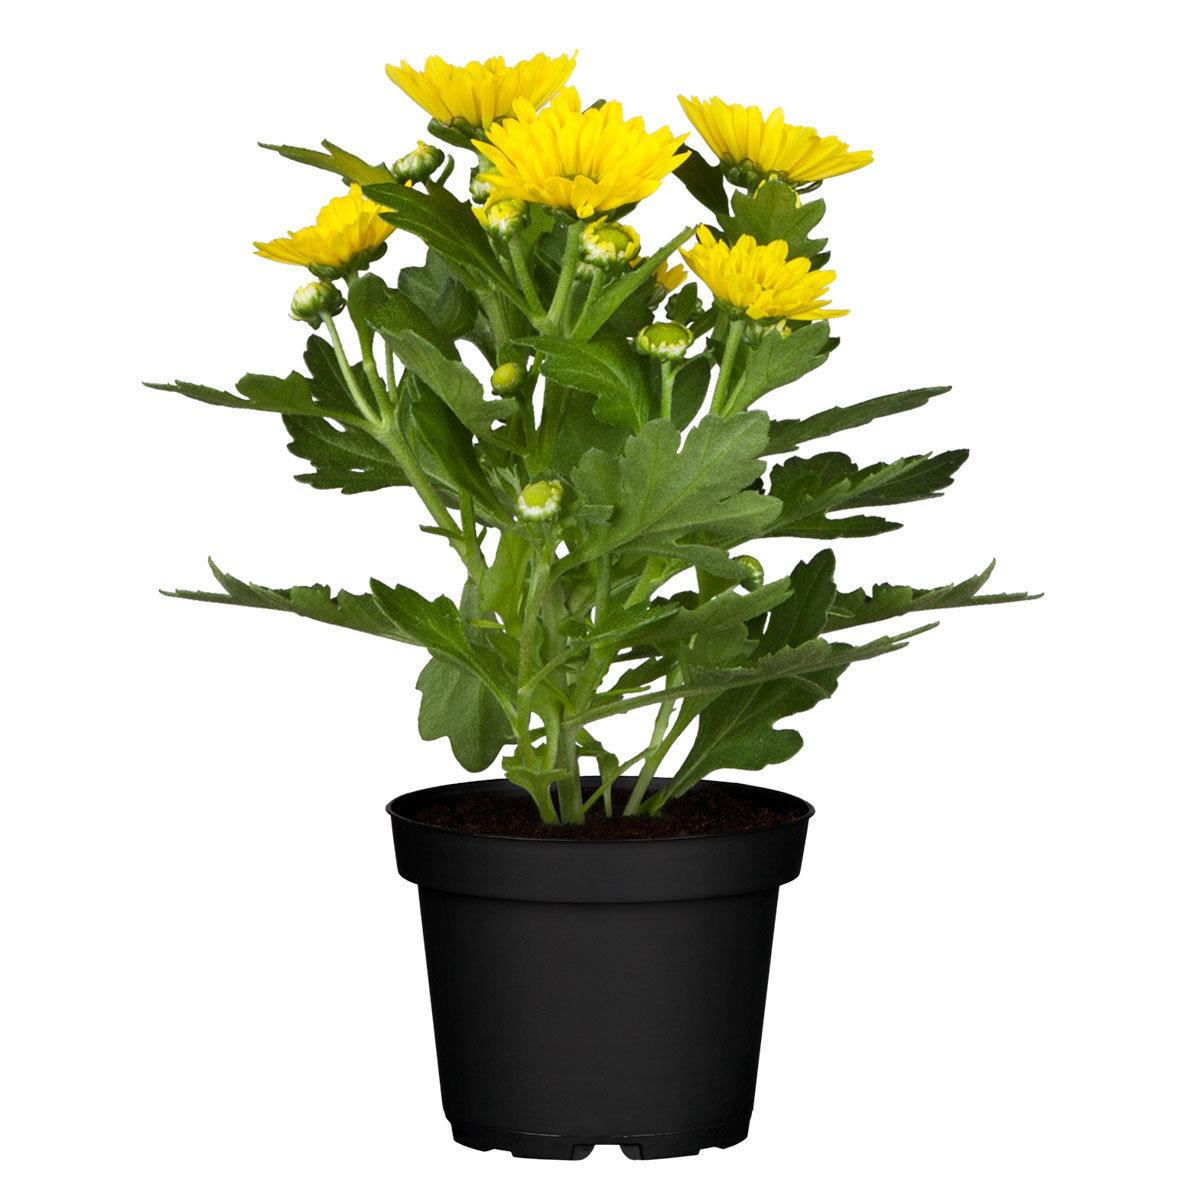 Herbst-Chrysantheme, gelb, im ca. 11 cm-Topf | #3